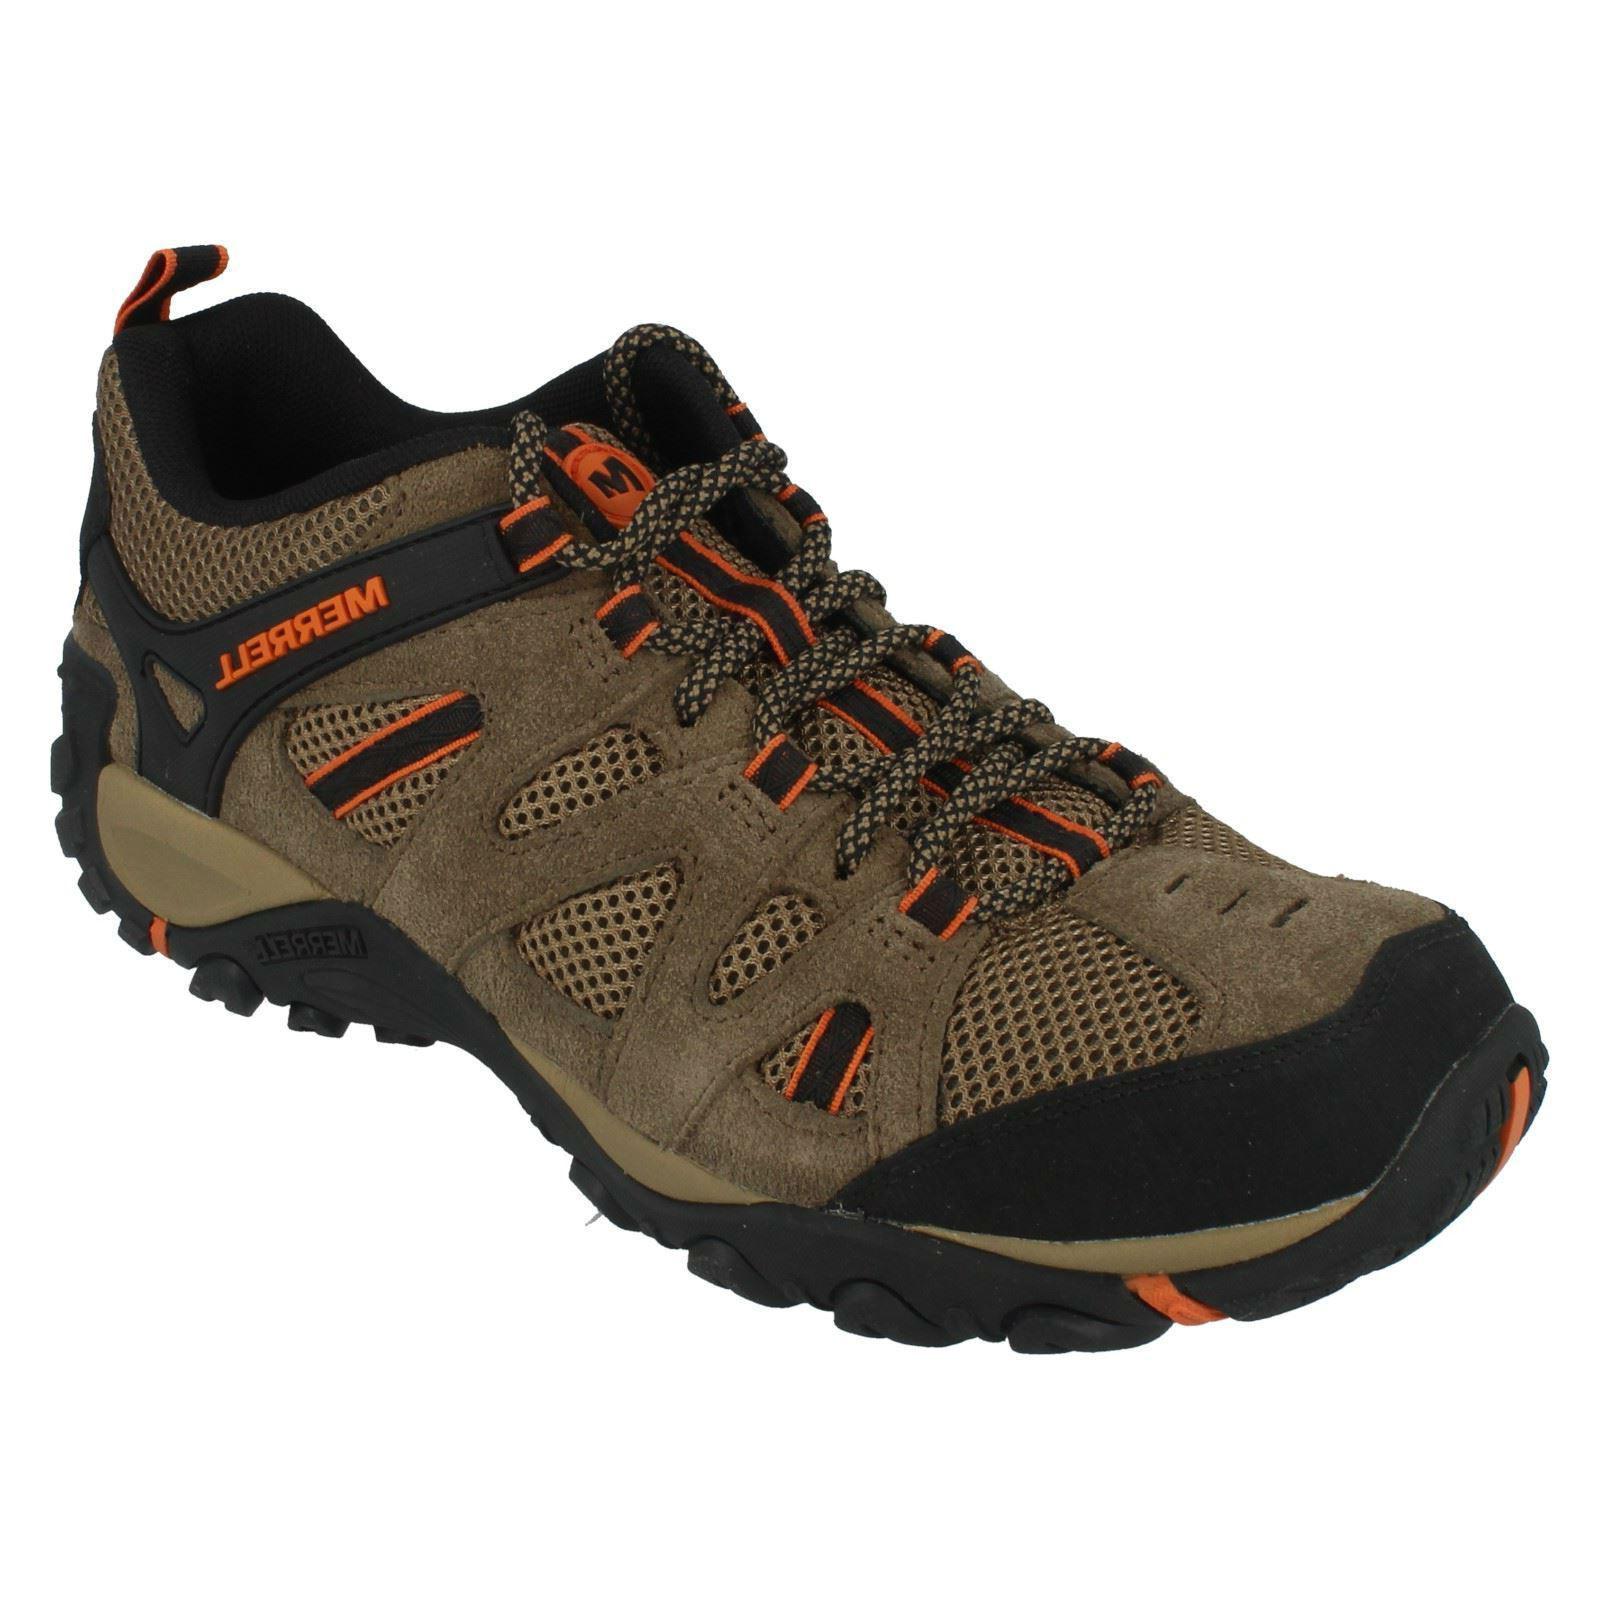 MERRELL YOKOTA ASCENDER Ventilación Para hombre Zapatos para Caminar Informal Tenis J343718C al aire libre